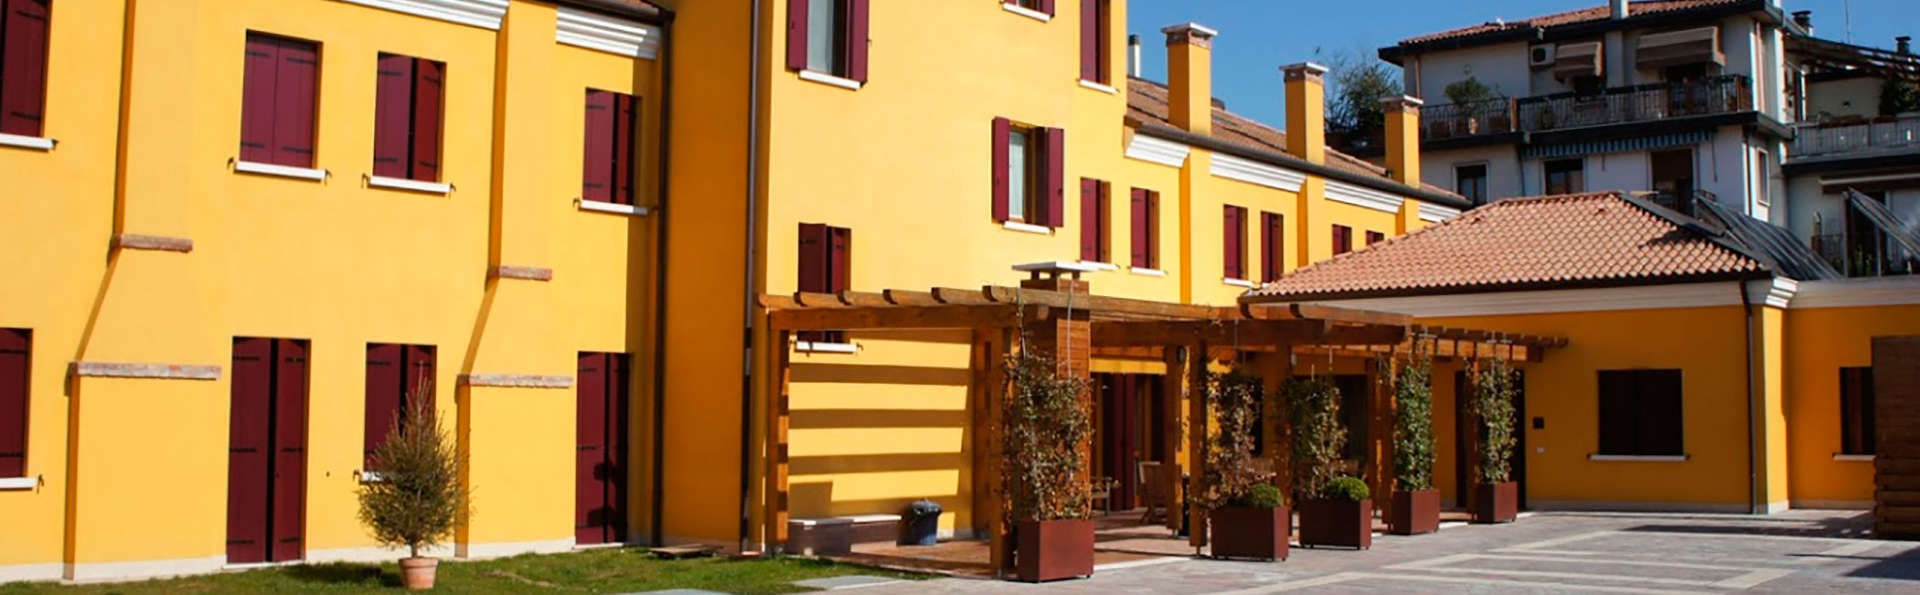 Hotel Villa Costanza - EDIT_front1.jpg